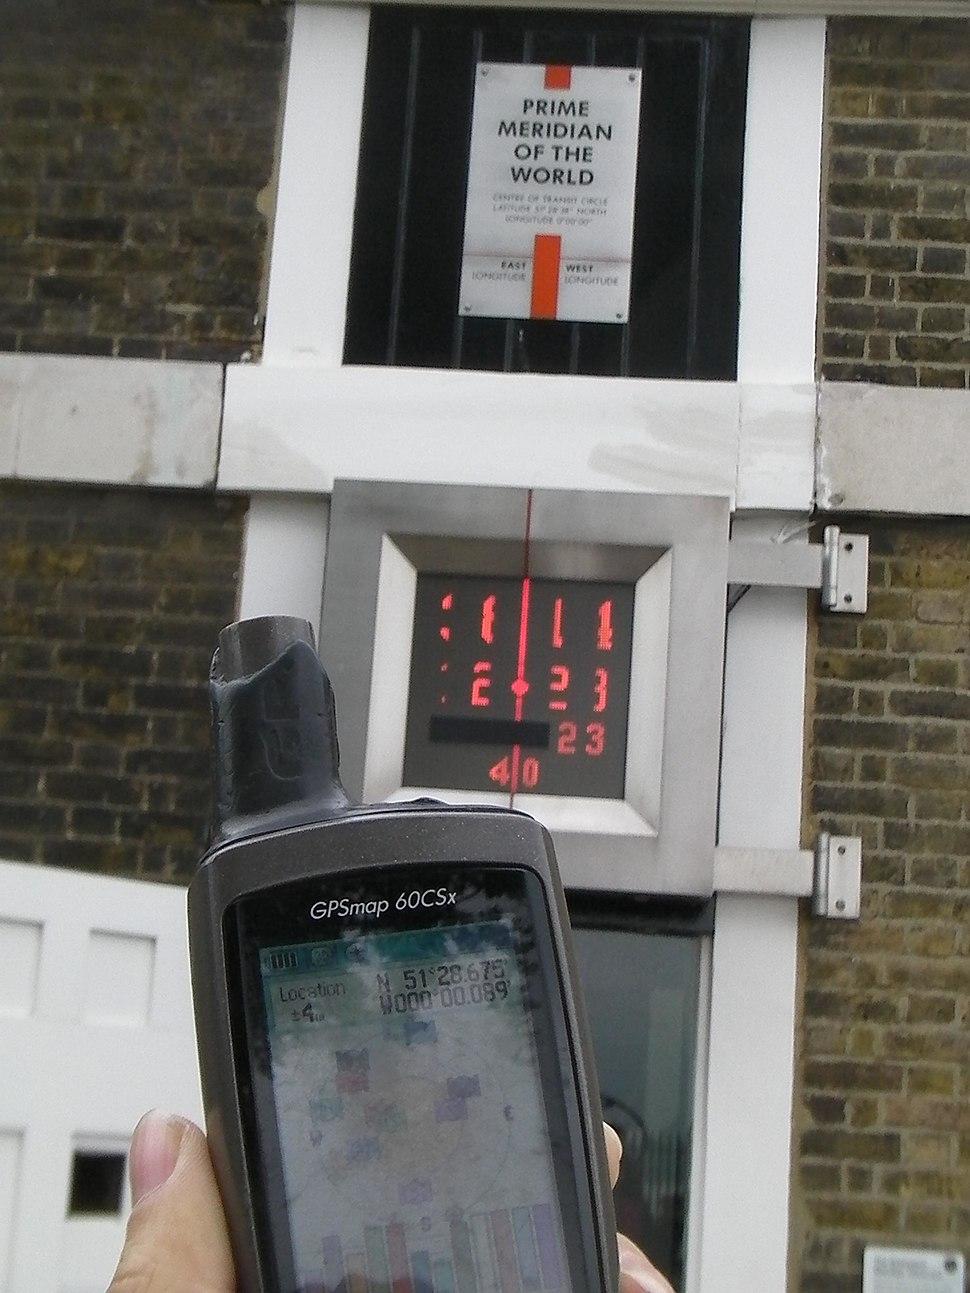 Garmin GPS at Greenwich Observatory